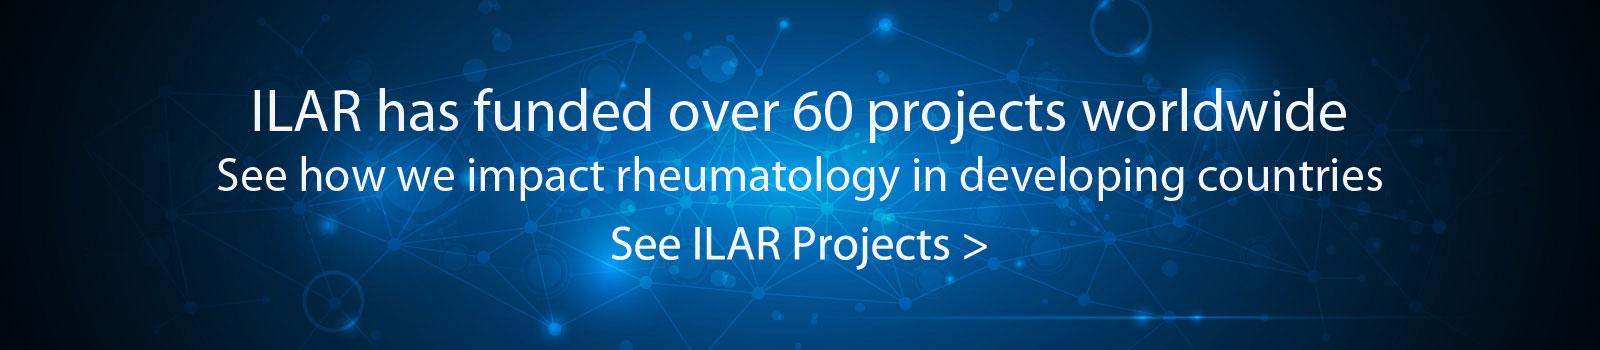 ILAR International League of Associations for Rheumatology